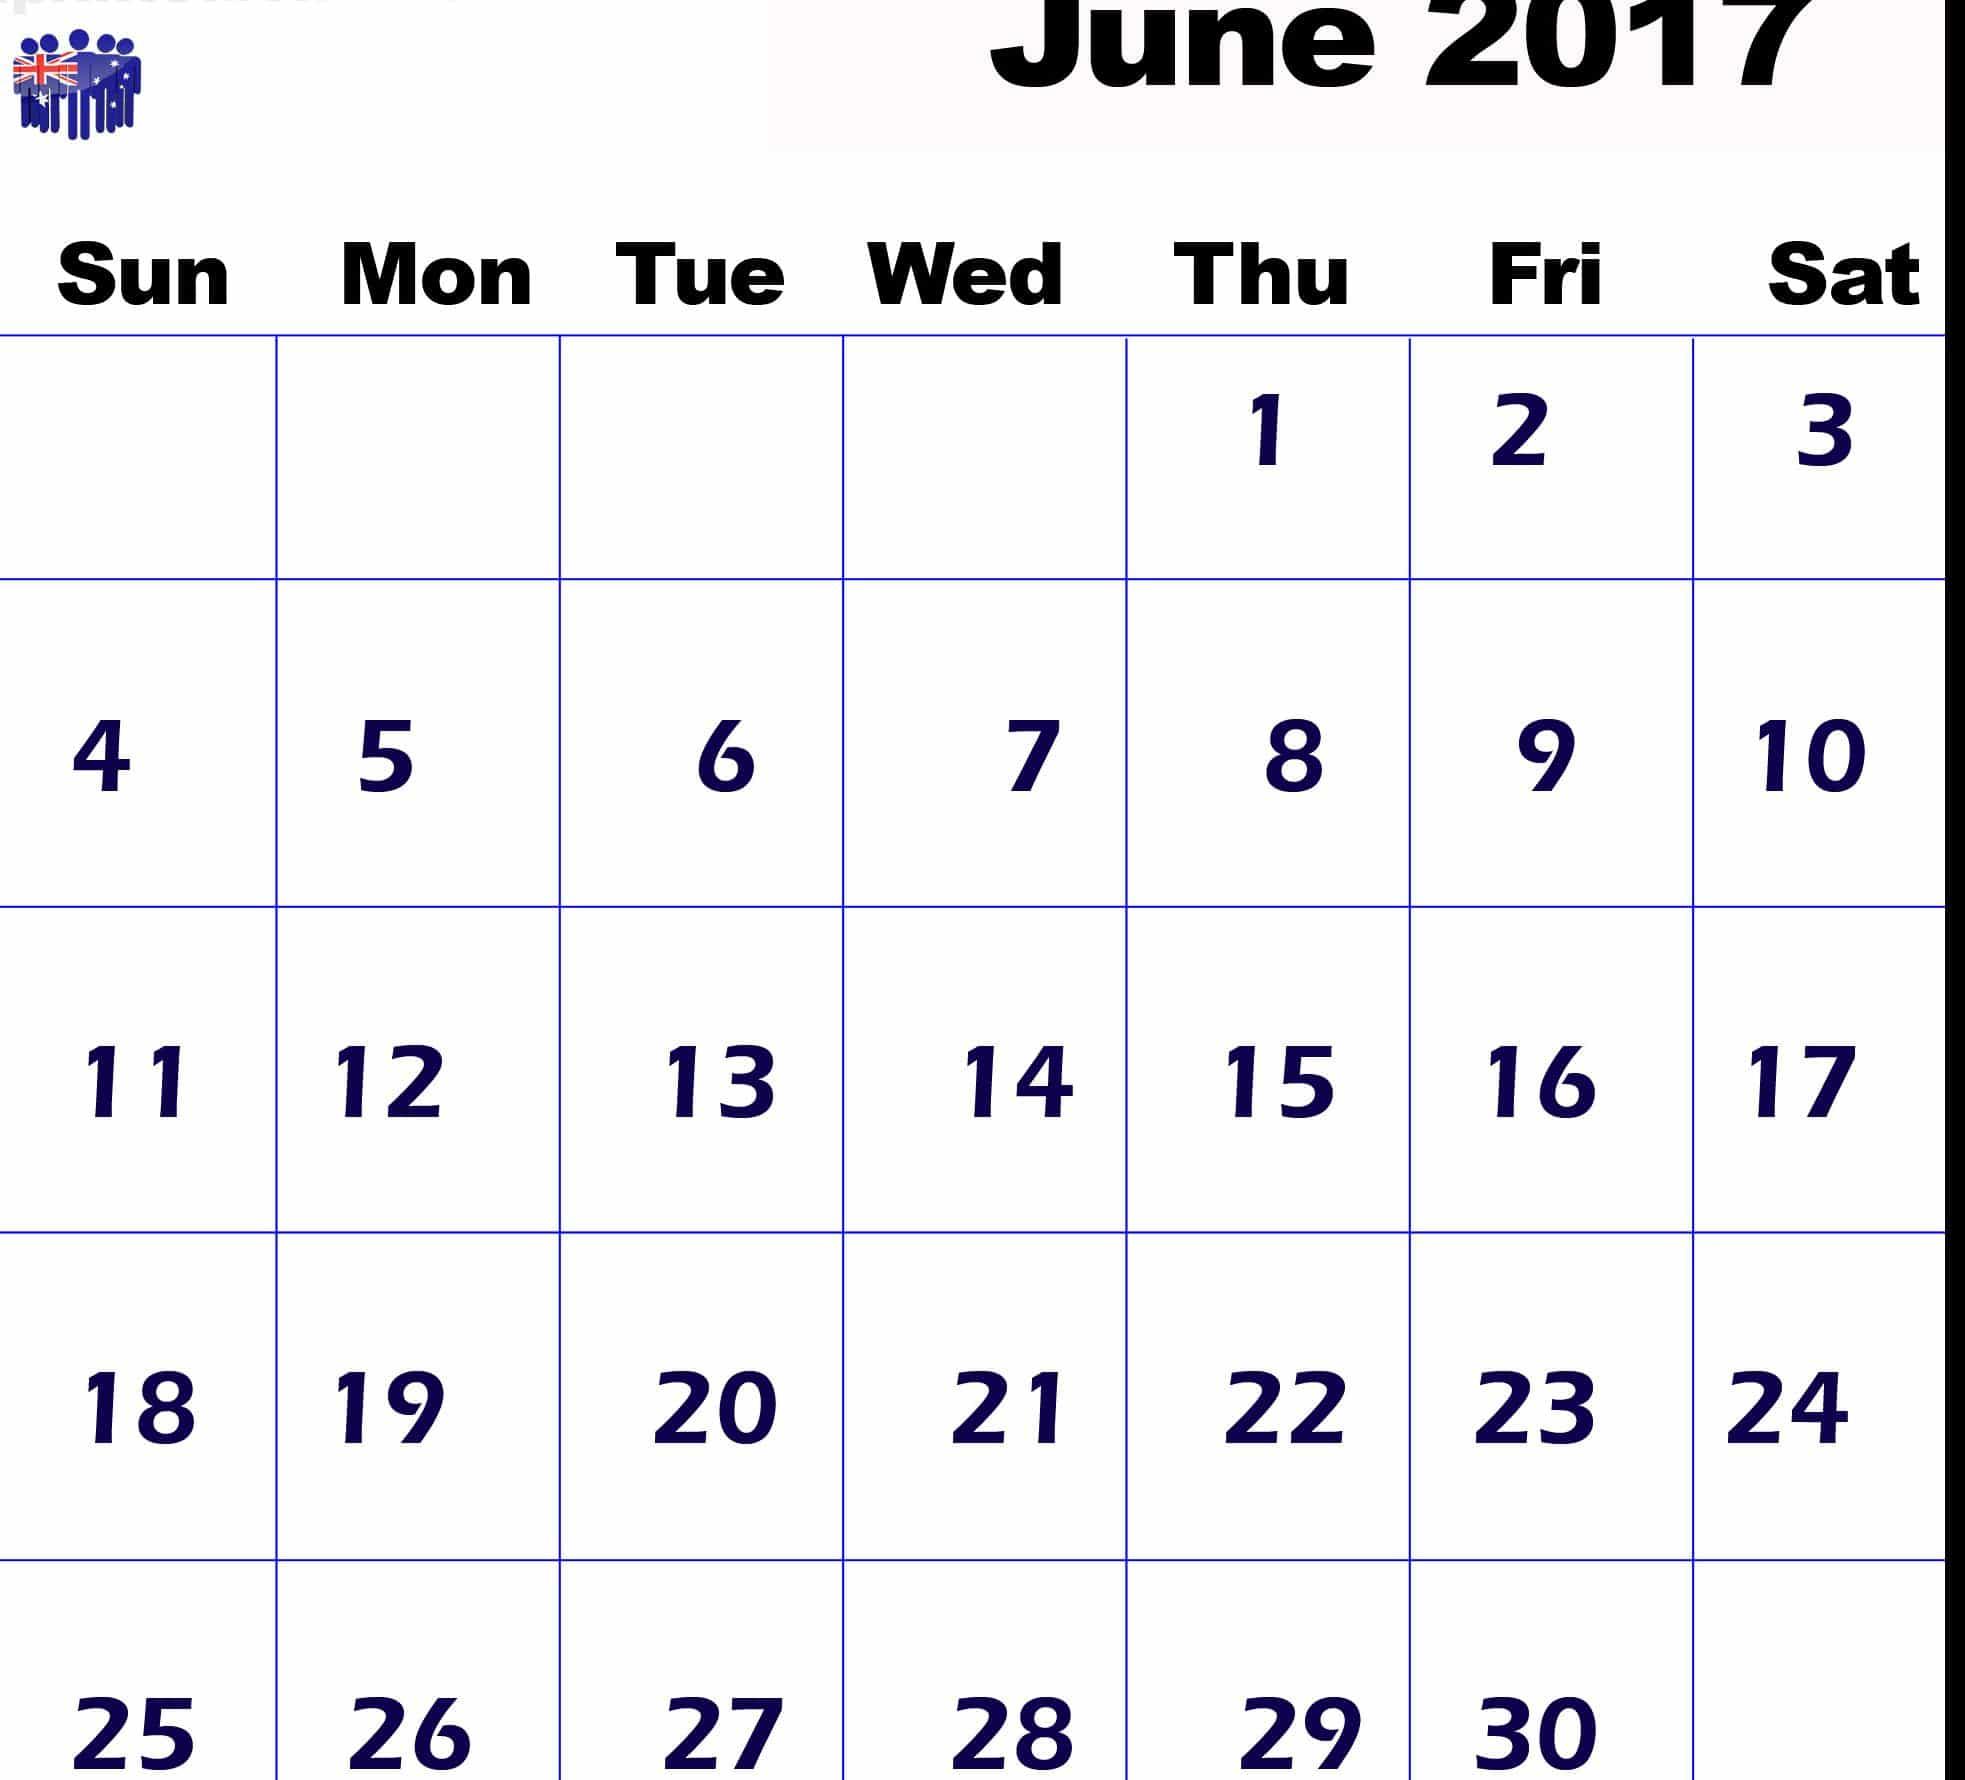 June 2017 calendar Template Australia